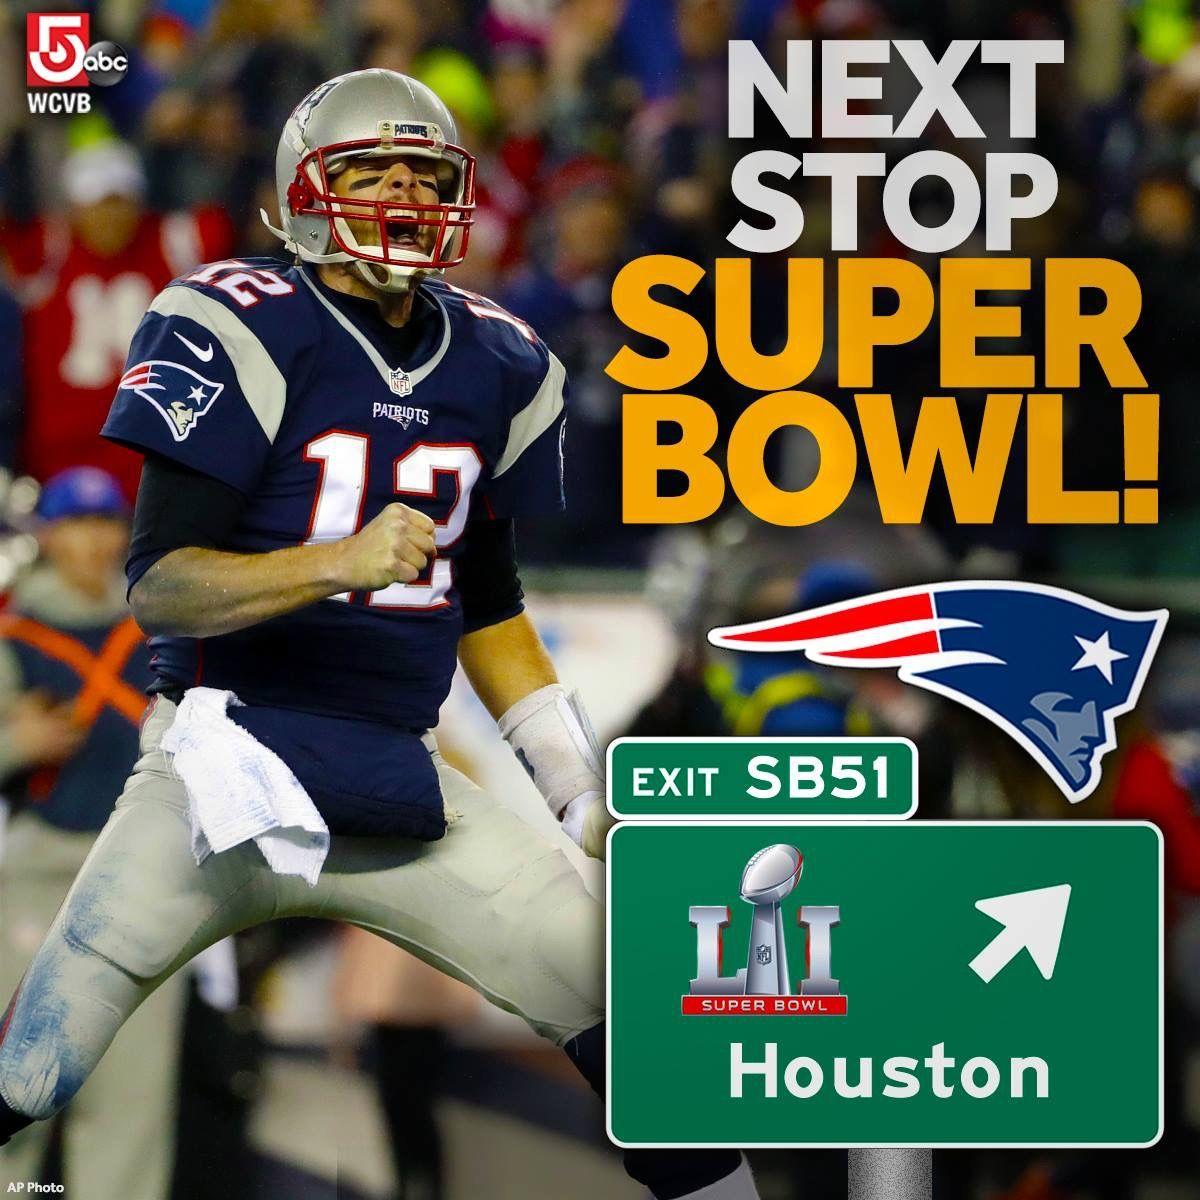 Nepats Onemore Nextstop Superbowlli Ontoatl Letsgo New England Patriots Merchandise New England Patriots Patriots Football